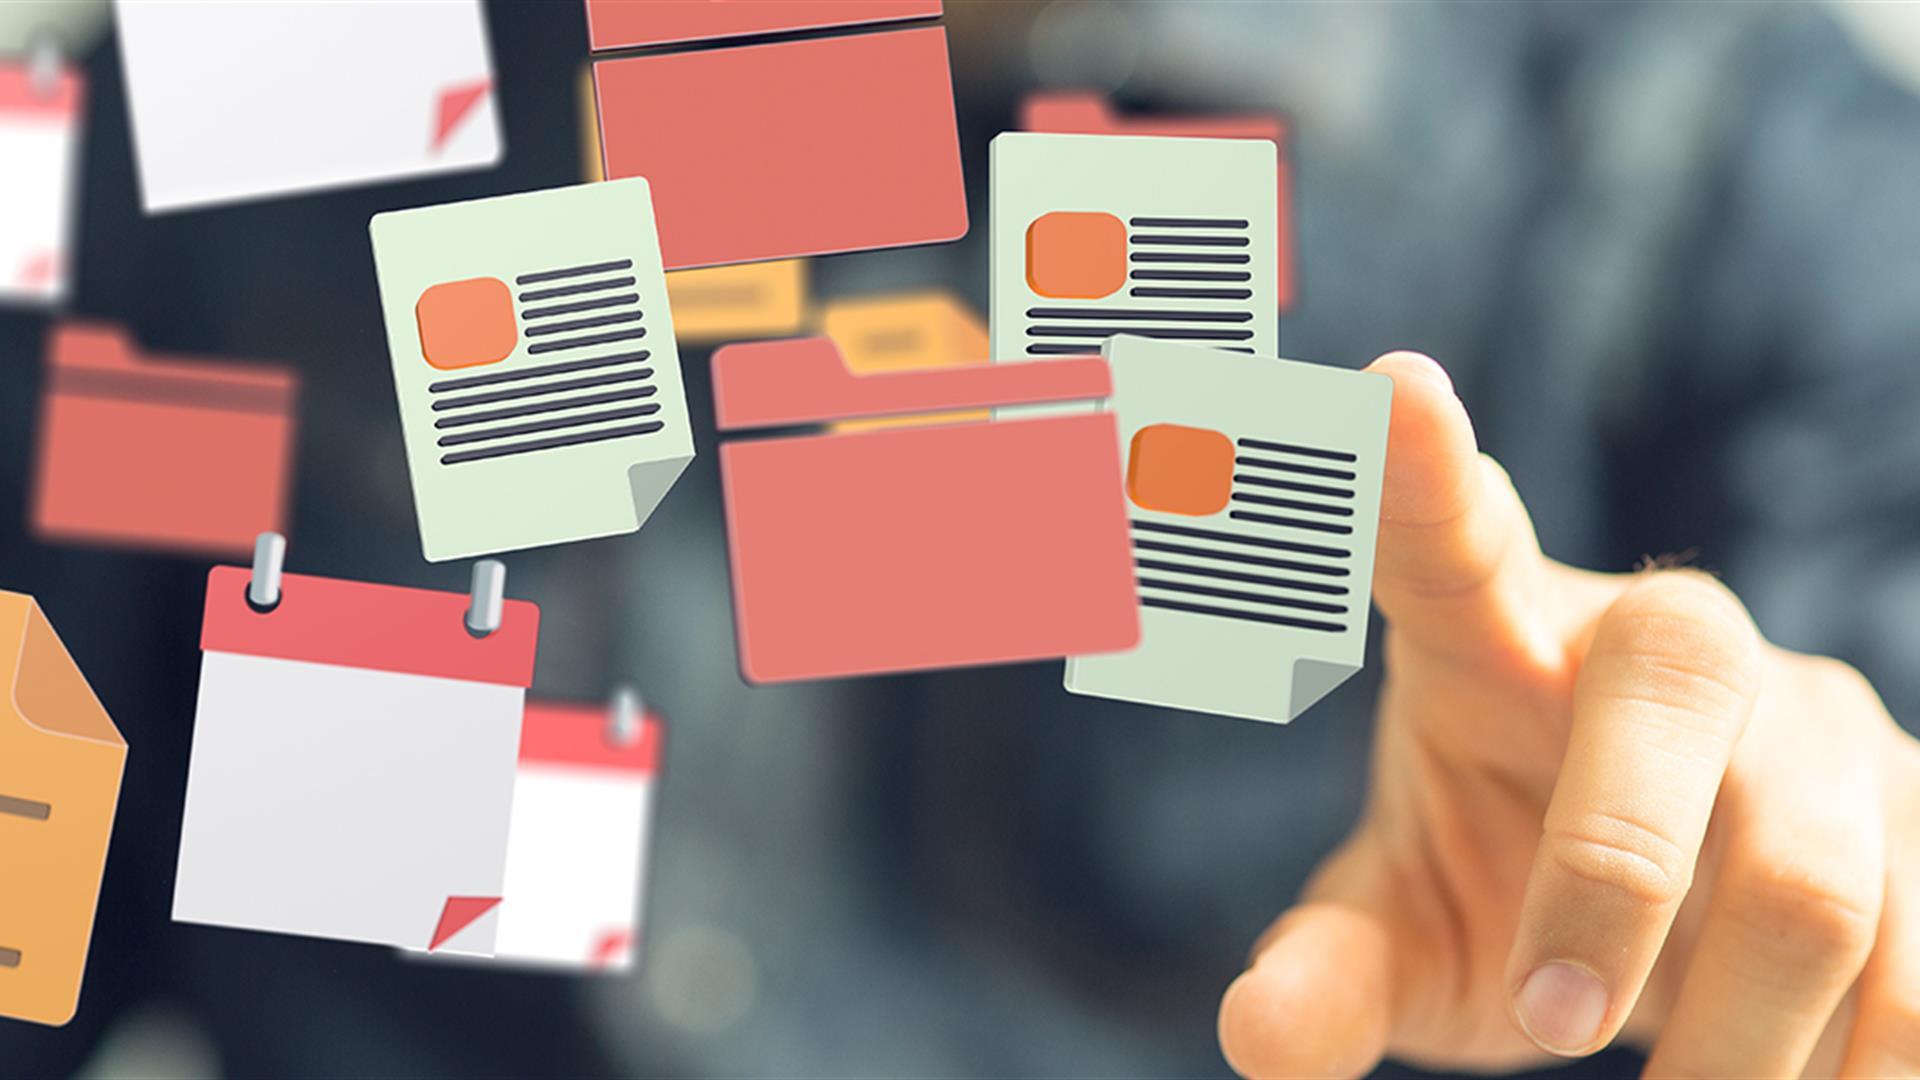 Personal Document Management